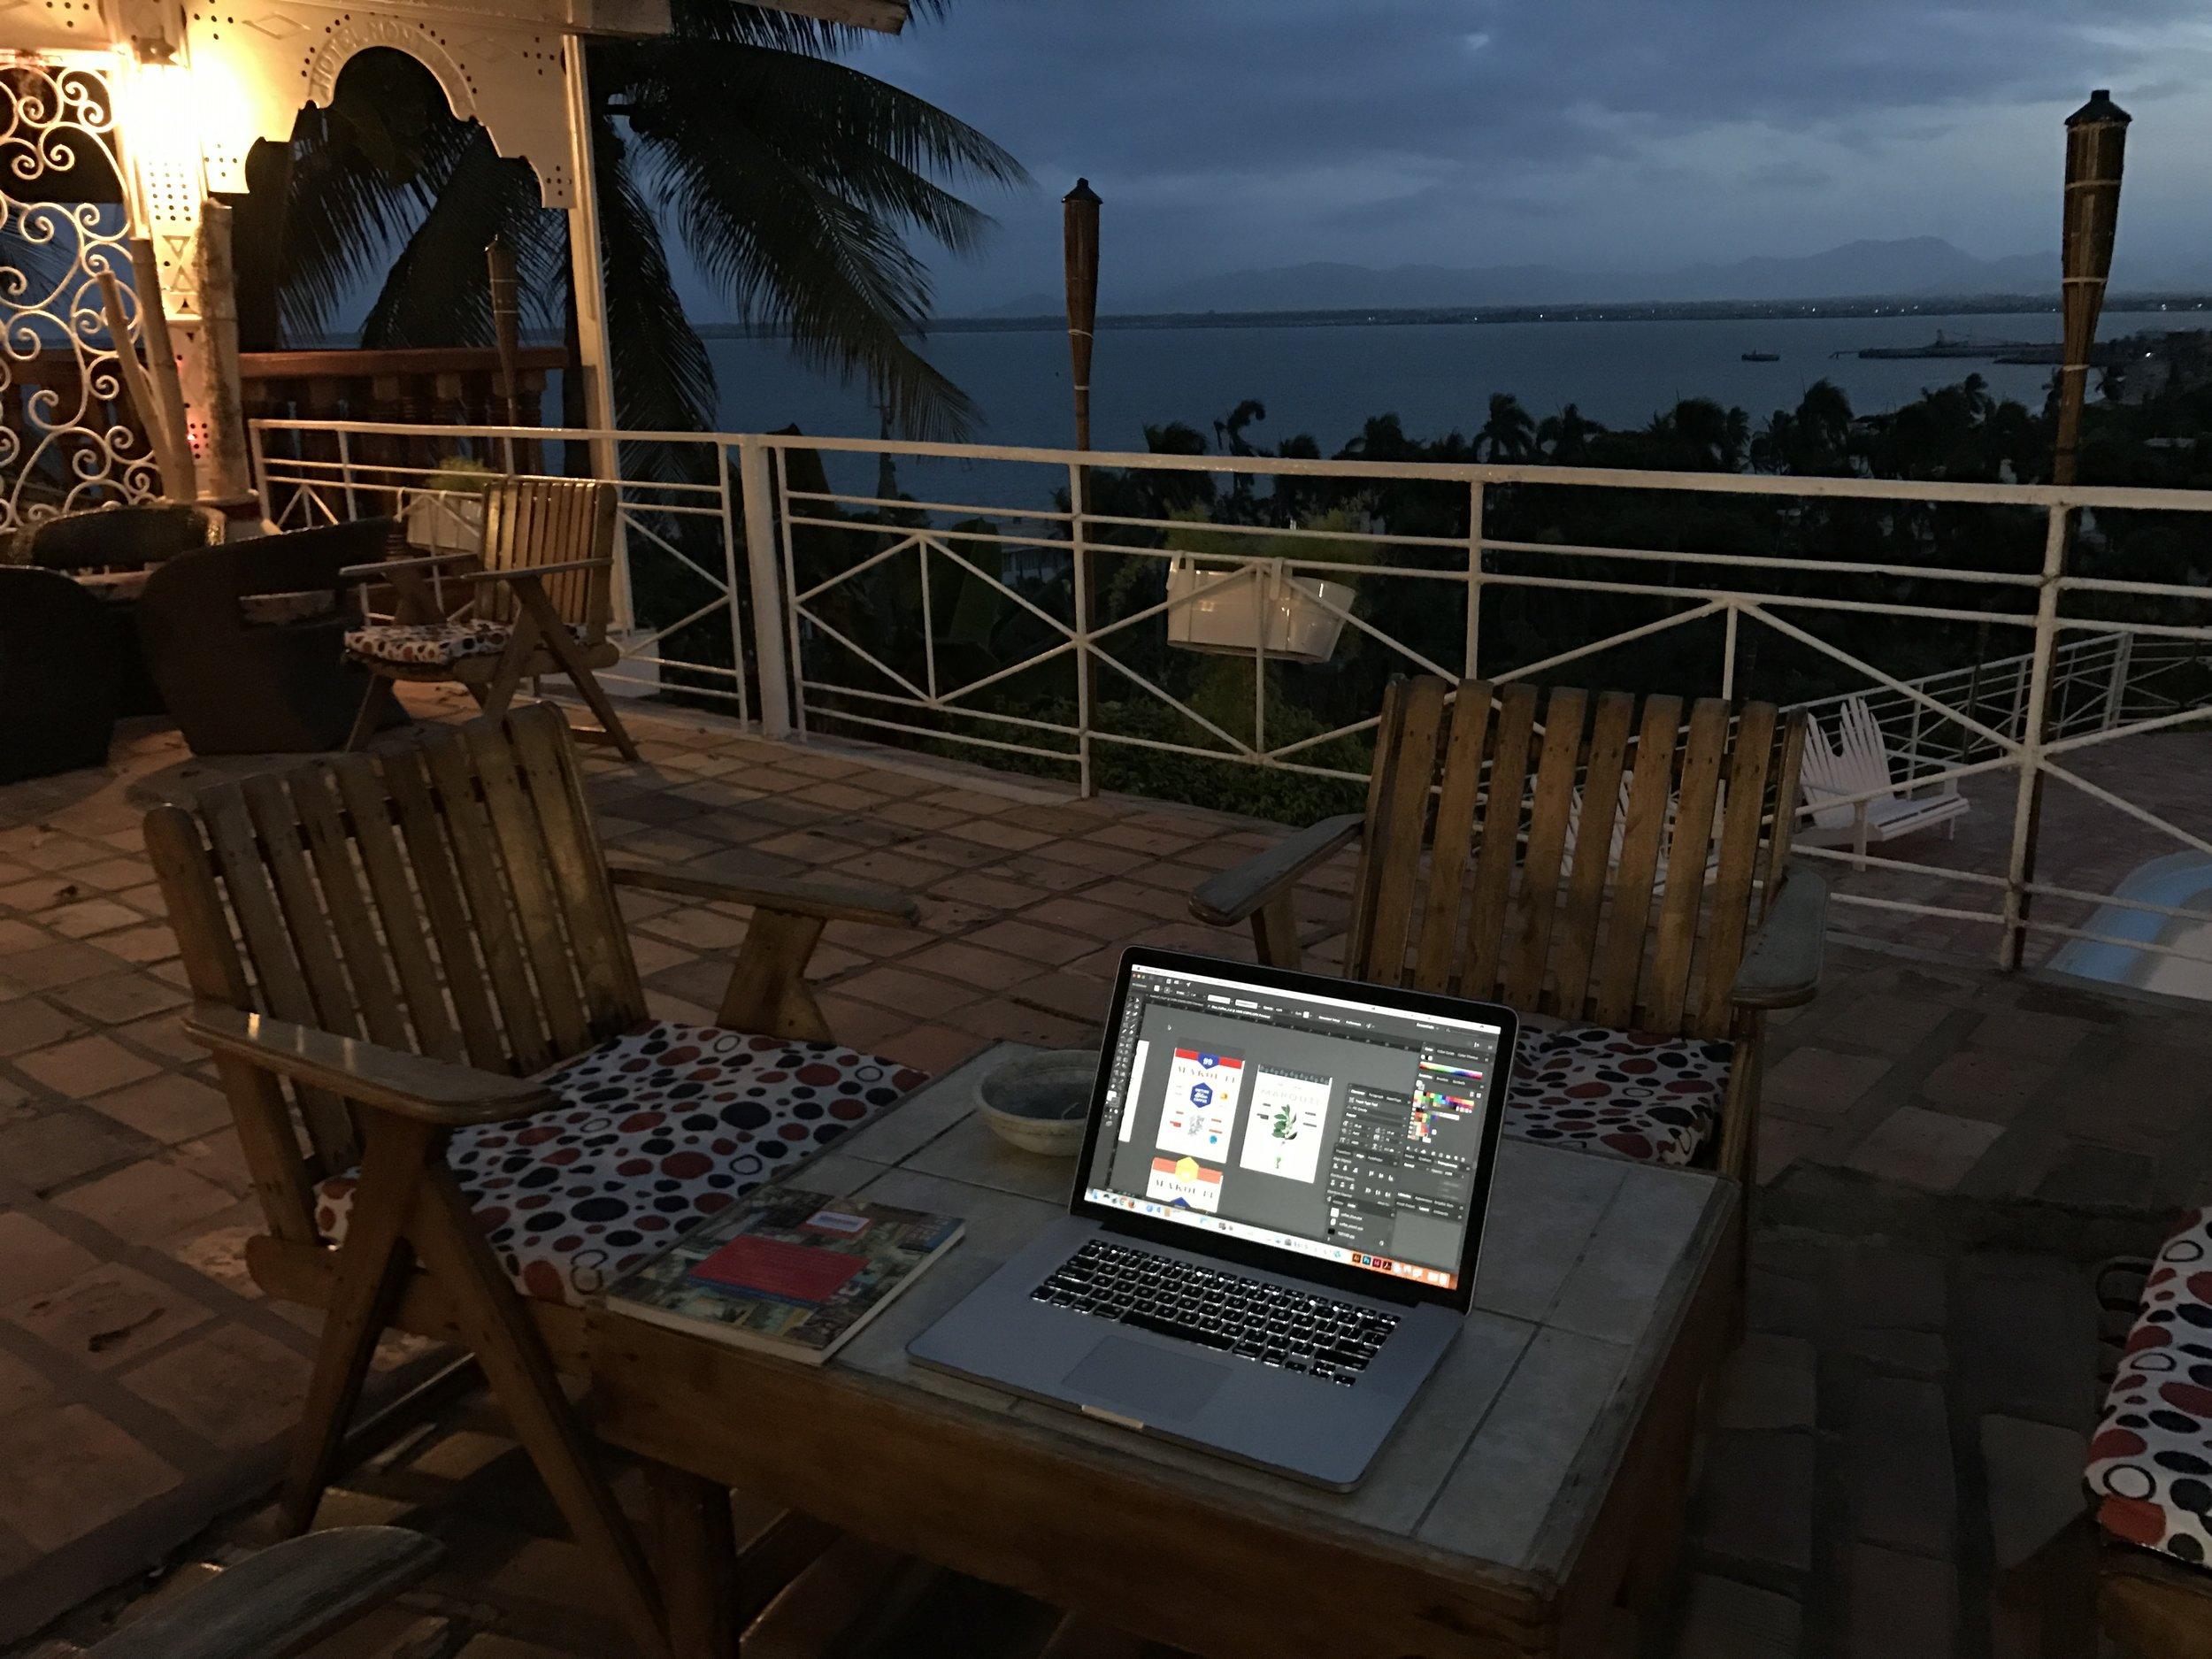 My office at Hotel Mont Joli, Cap-Haïtien